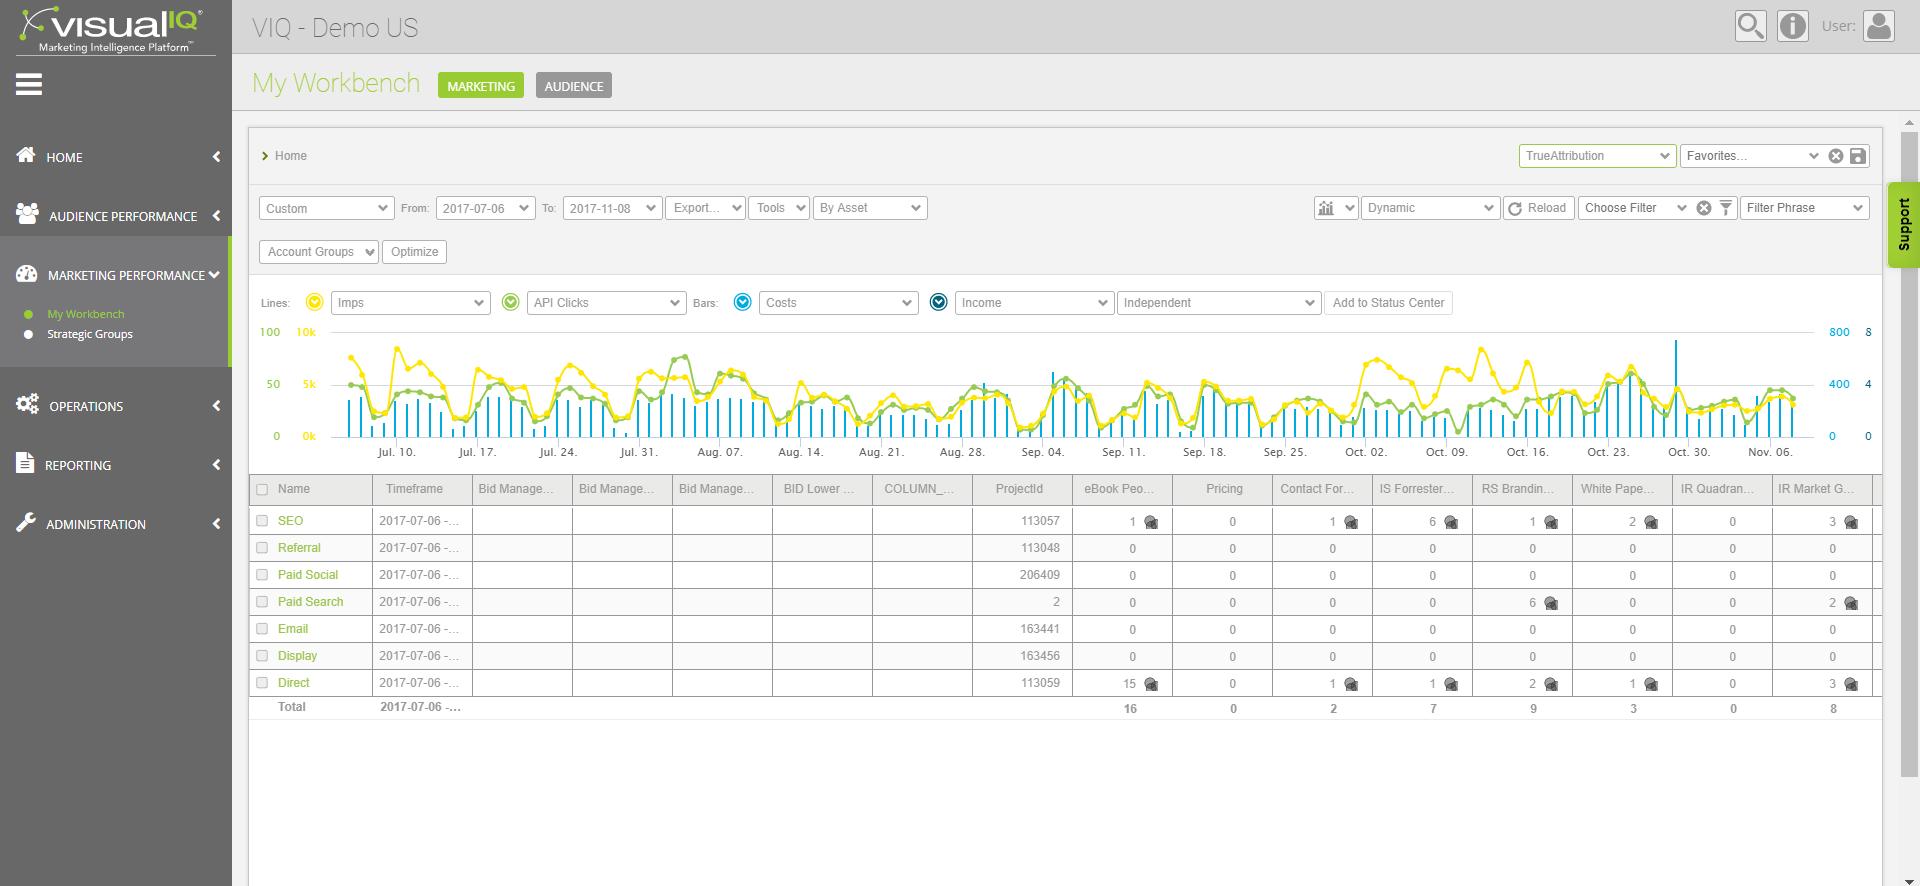 visual IQ Demo - Visual IQ Marketing Intelligence Platform - My Workbench - Marketing View